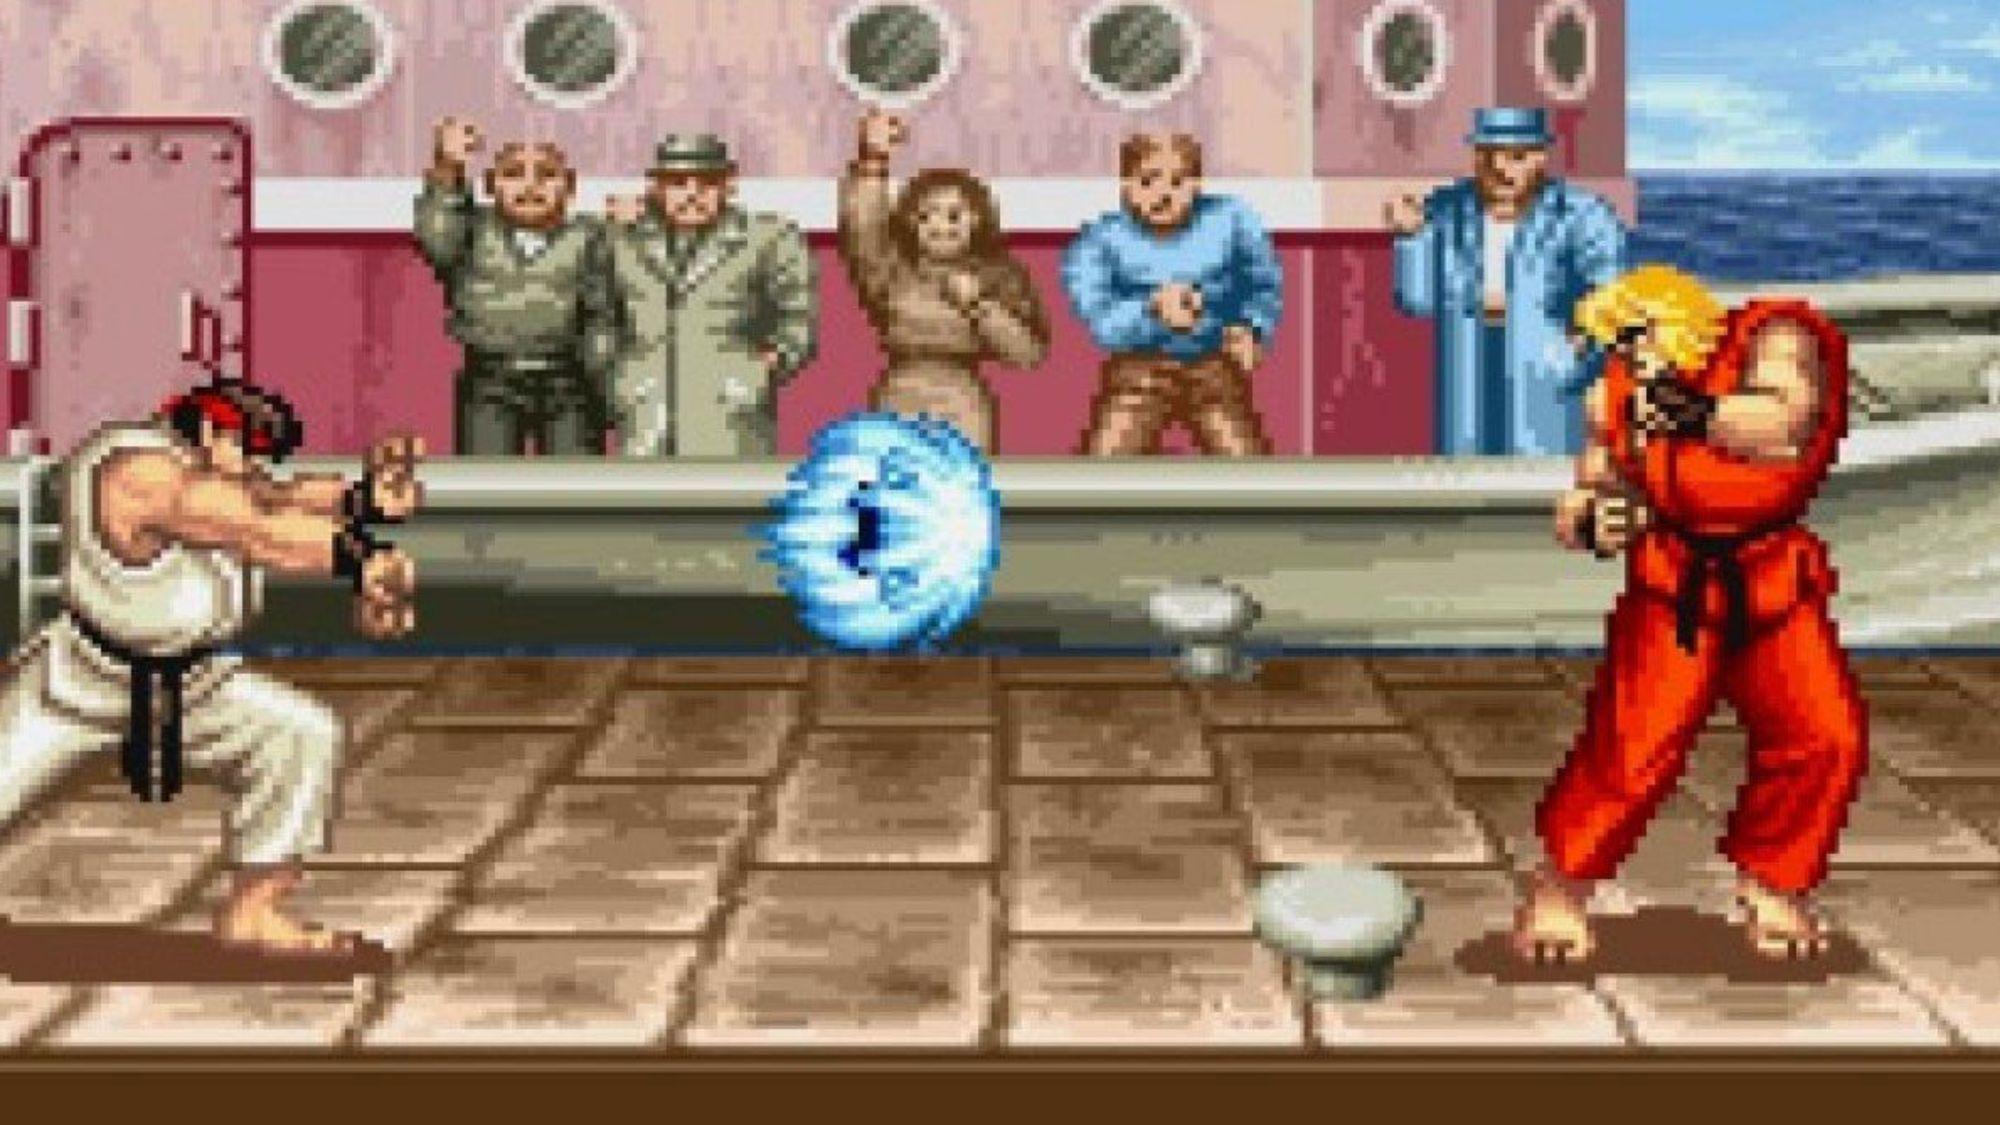 Exemple d'ecran avec la borne d'arcade Street Fighter 2